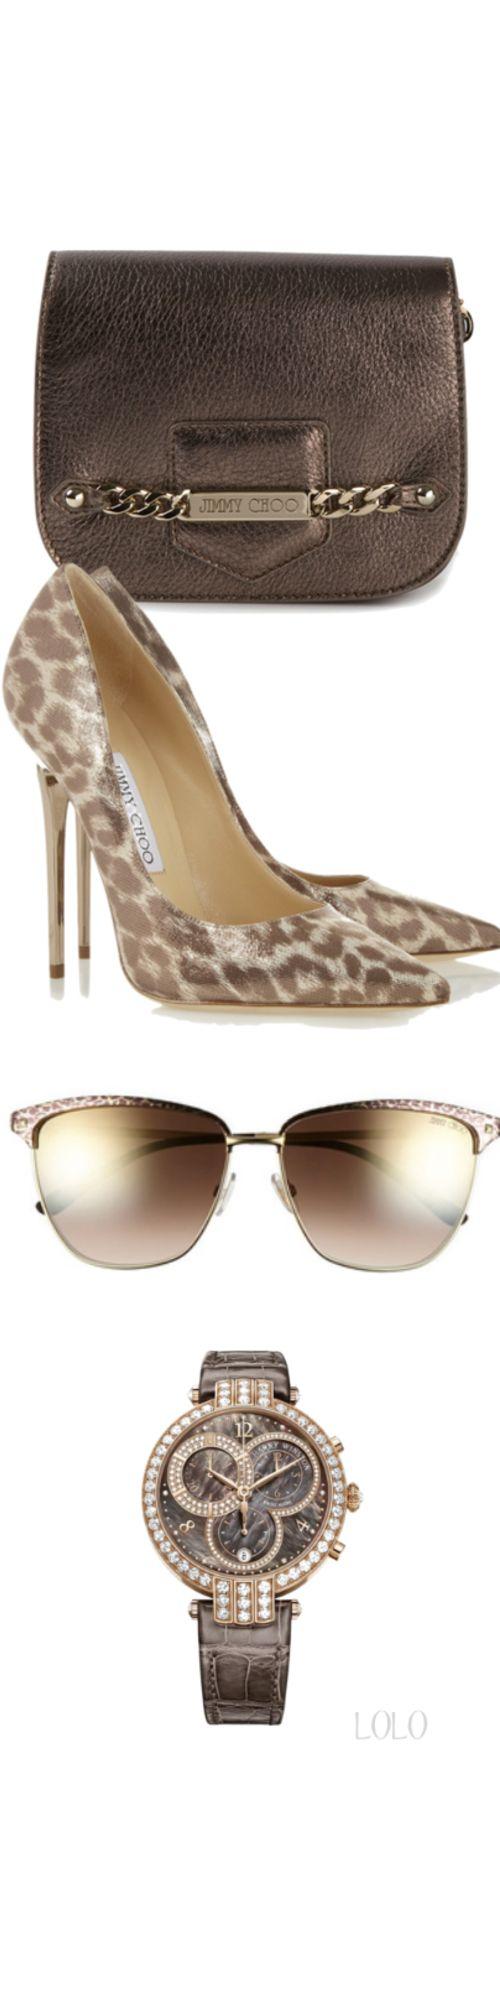 Choo style essentials §